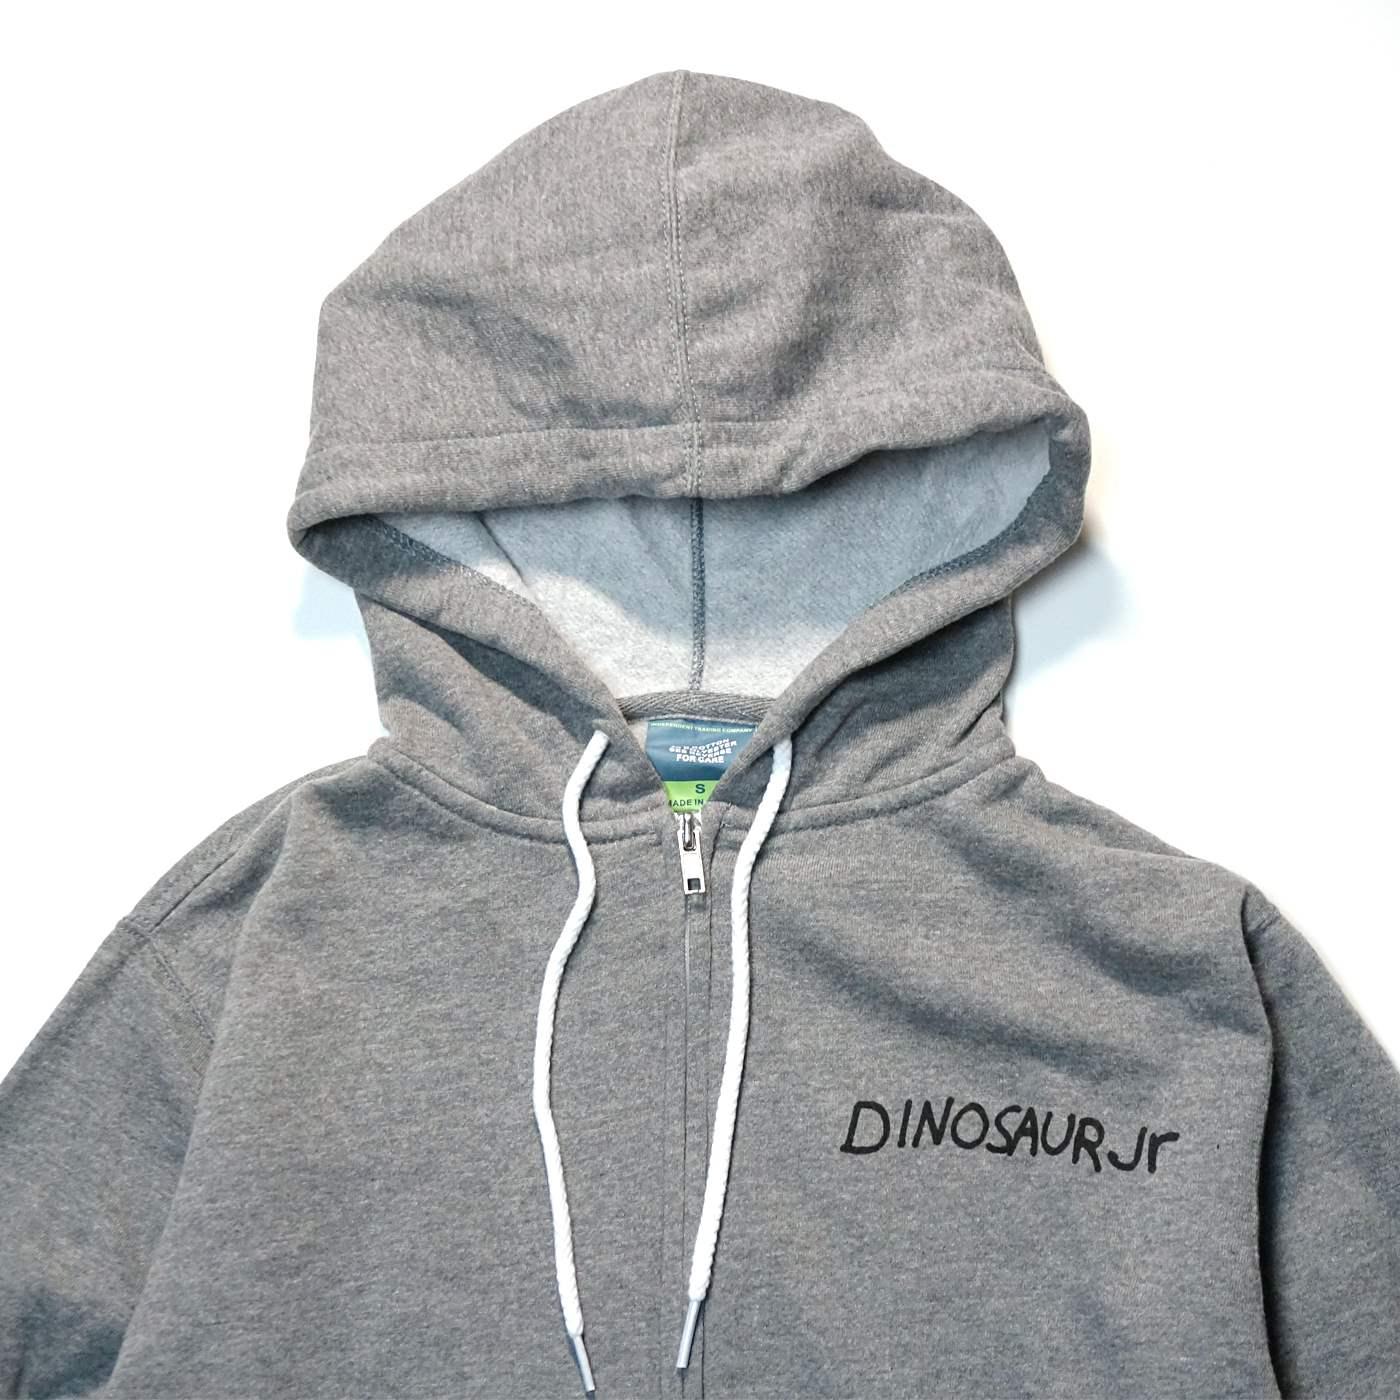 Dinosaur Jr. (ダイナソーJr) ジップパーカー / Green Mind Hoodie - グレー